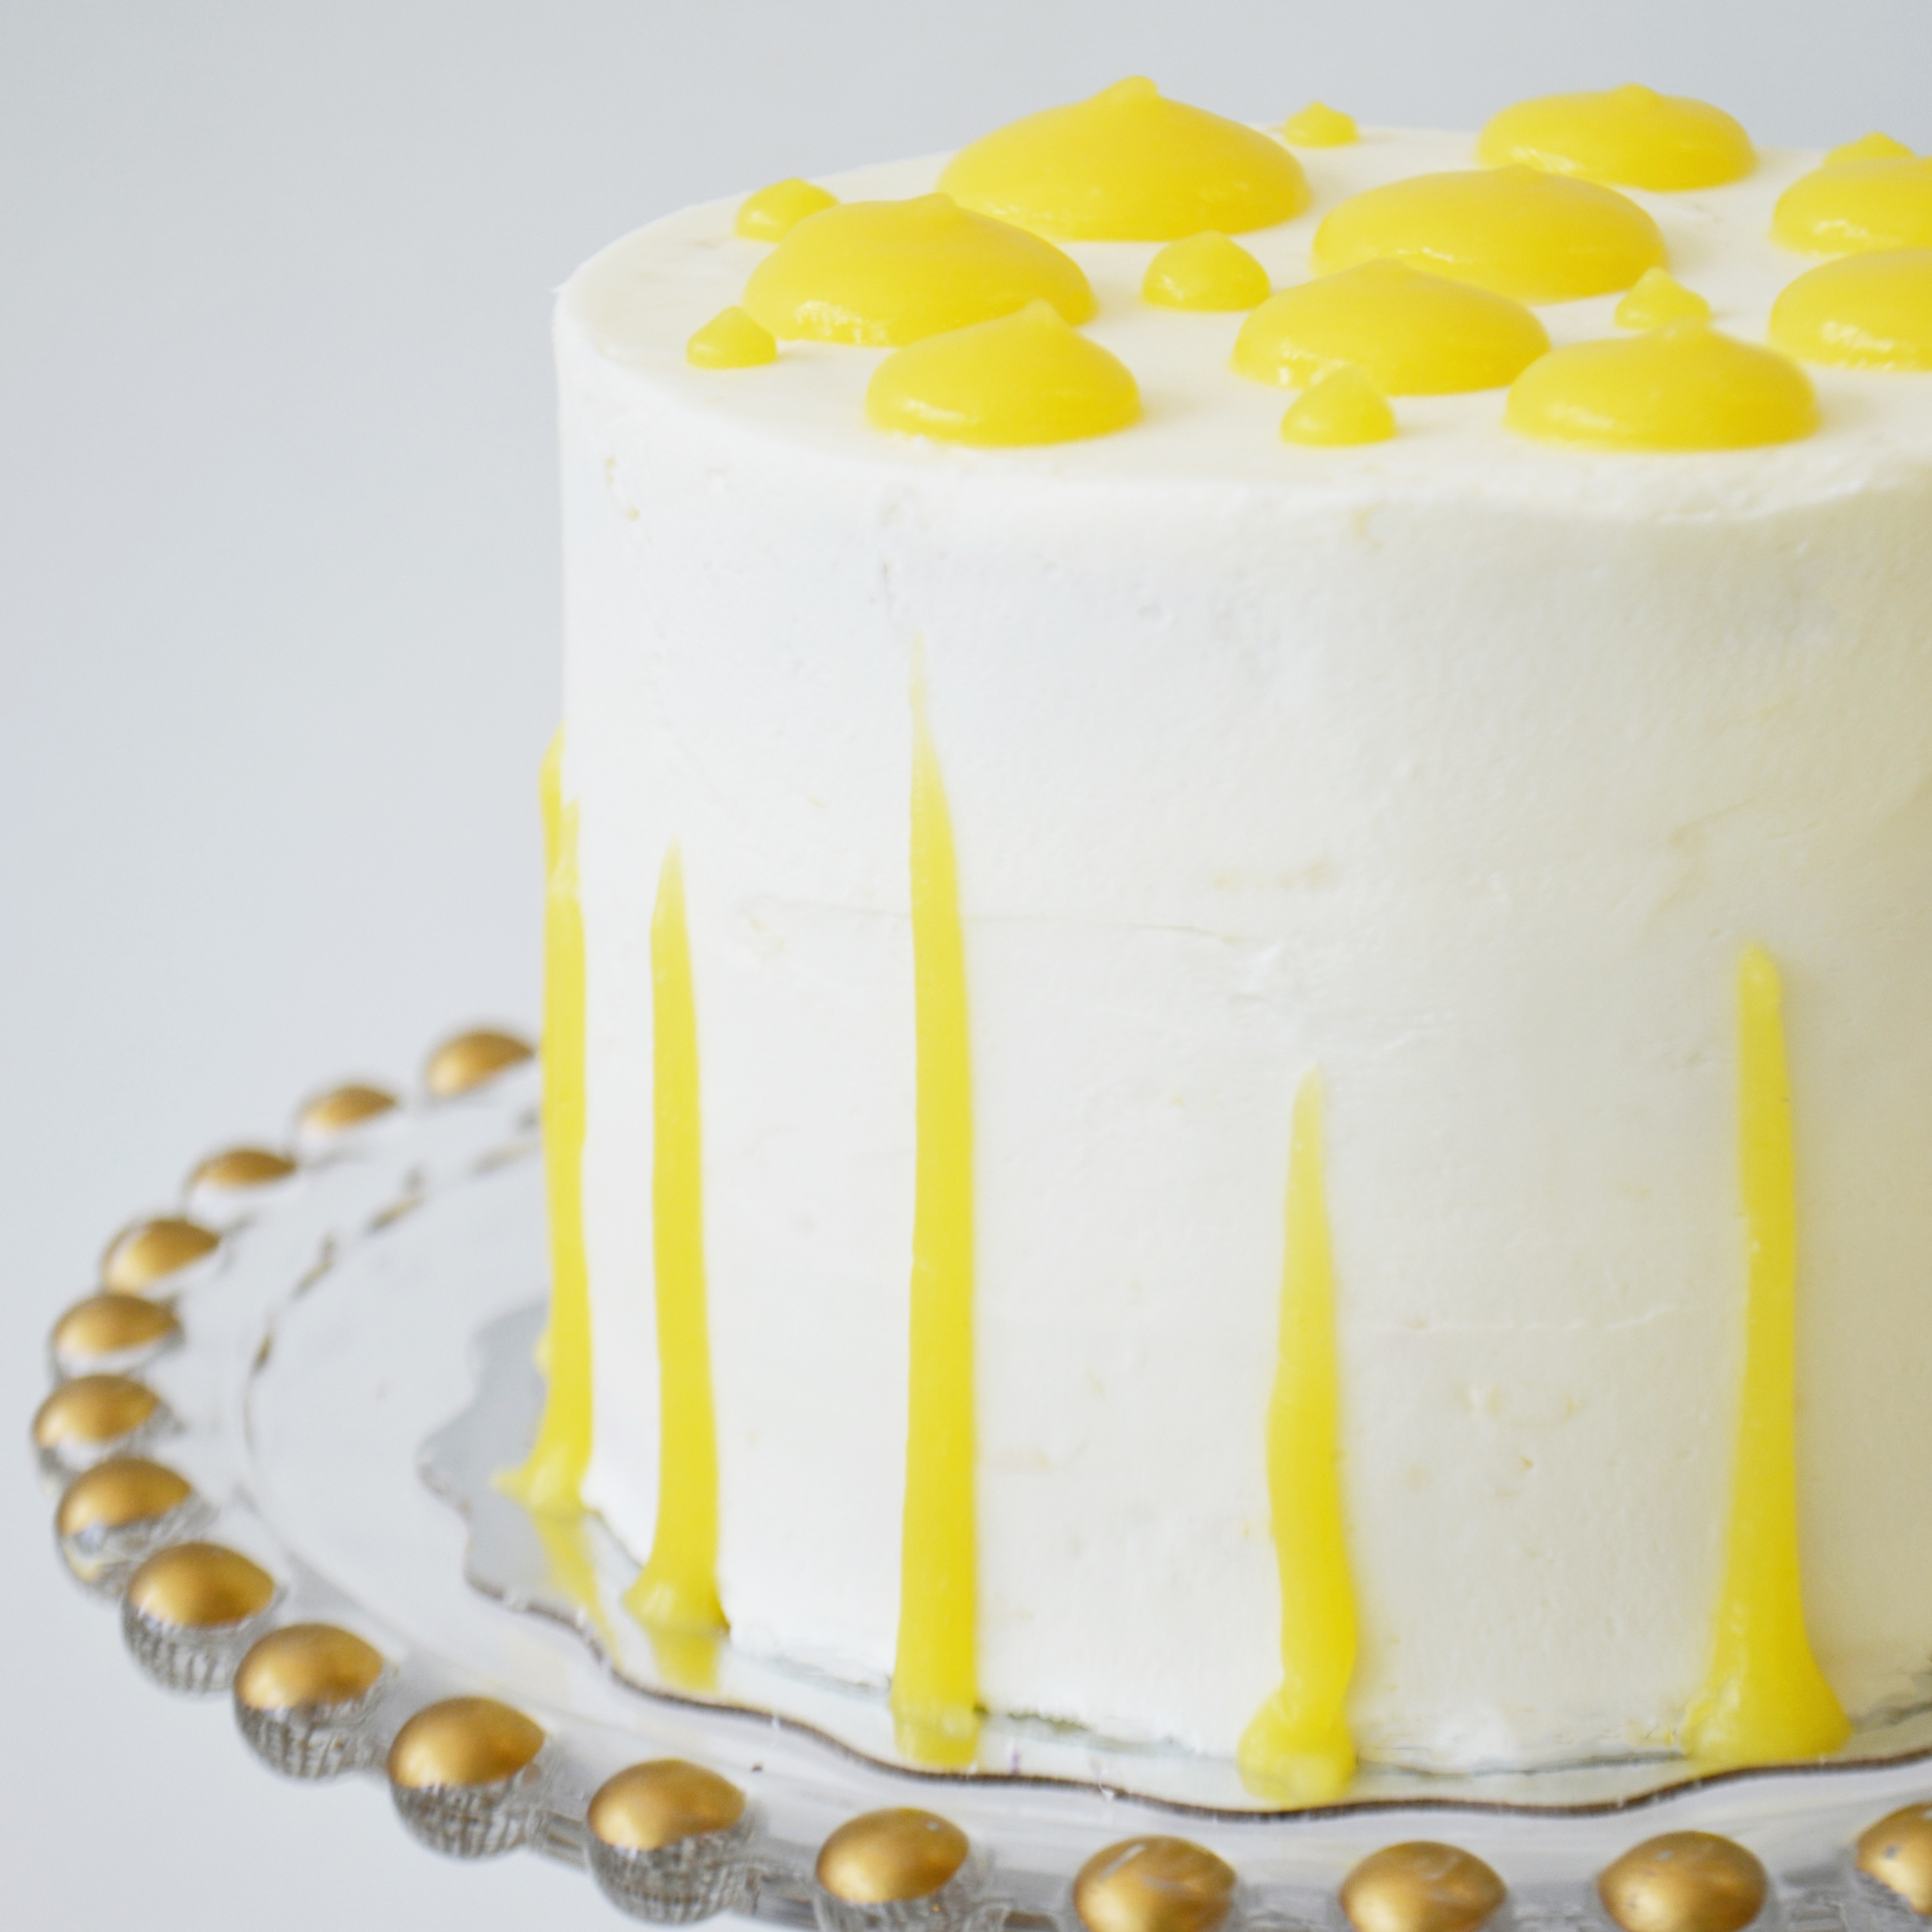 Lemon Cake  - Three layers of dense vanilla cake filled with lemon curd and lemon buttercream.